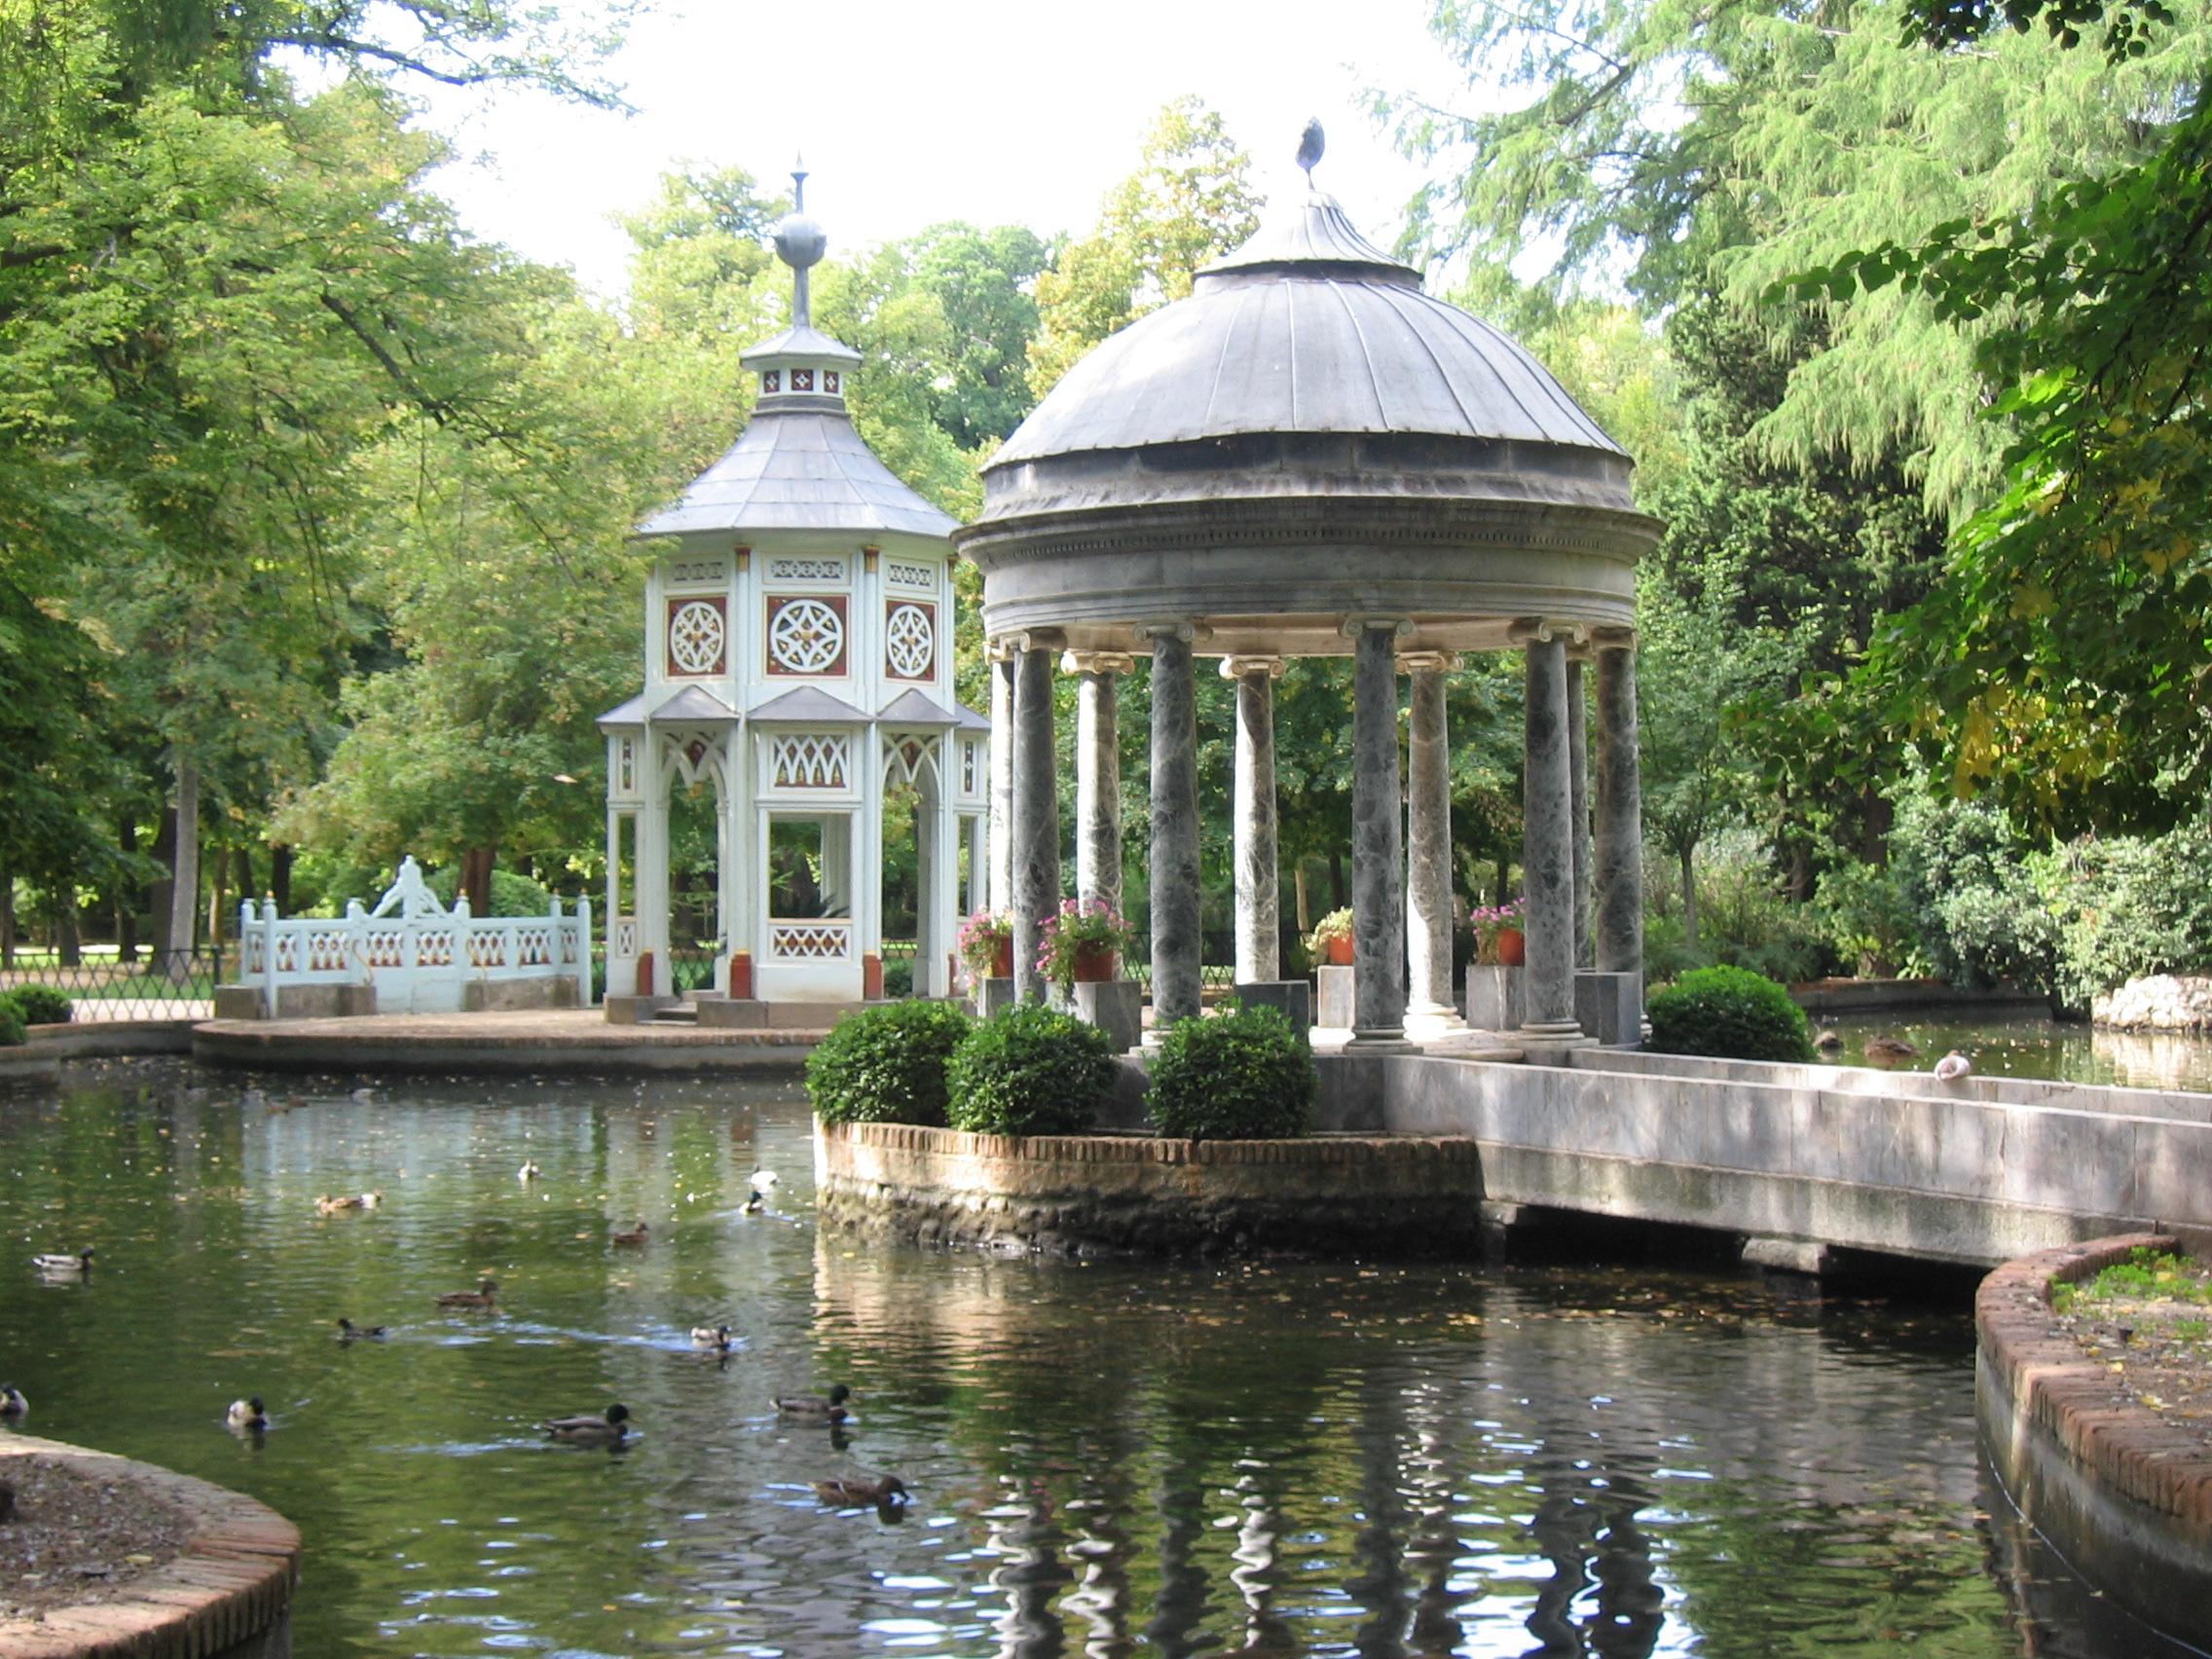 Visitas guiadas aranjuez abside gestion cultural madrid - Jardin del principe aranjuez ...